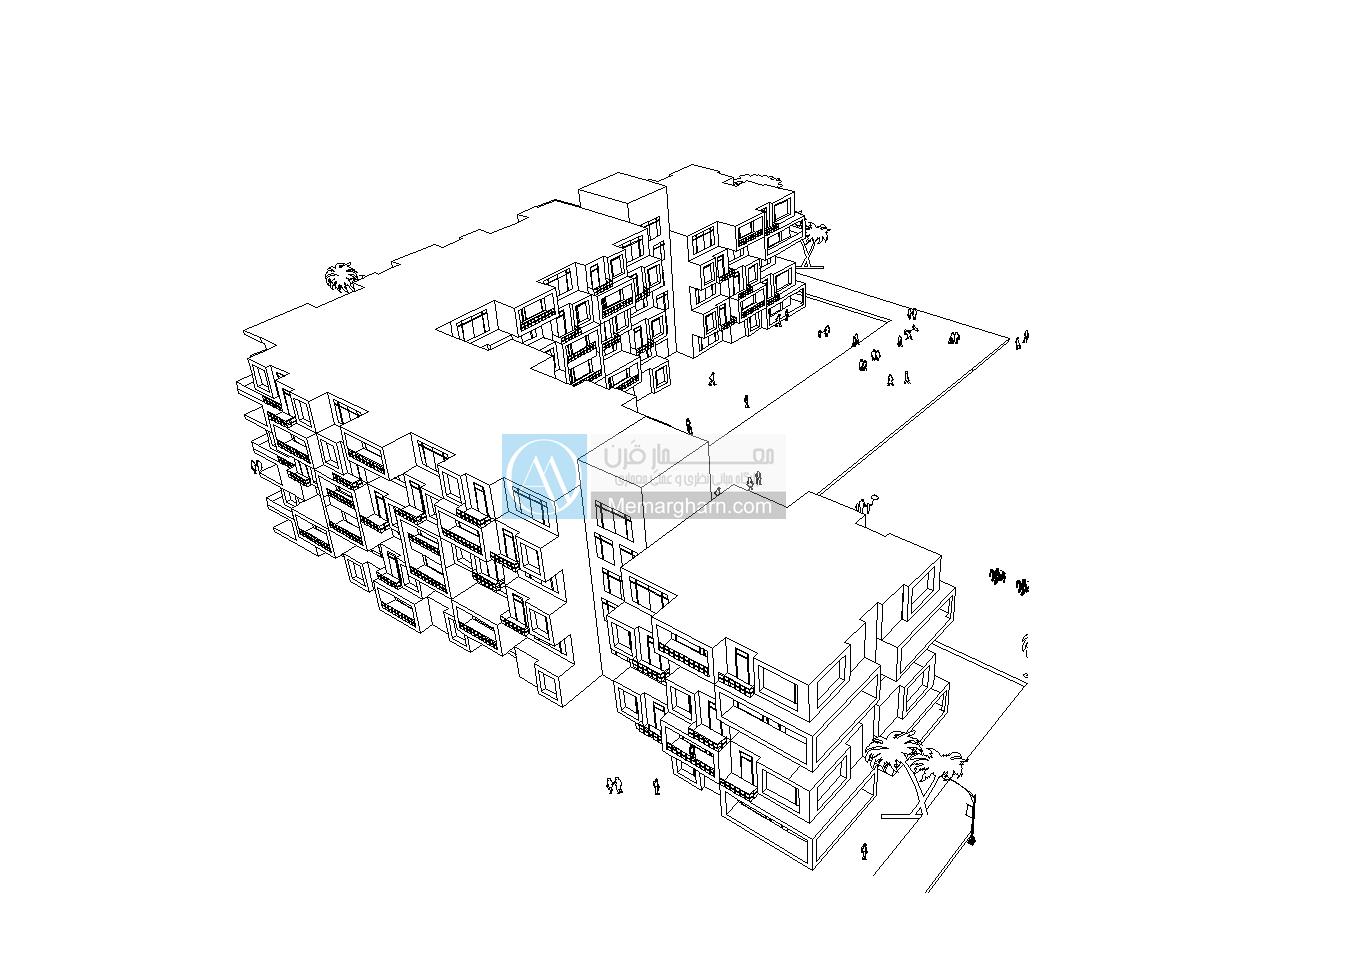 طرح 5 مجتمع مسکونی